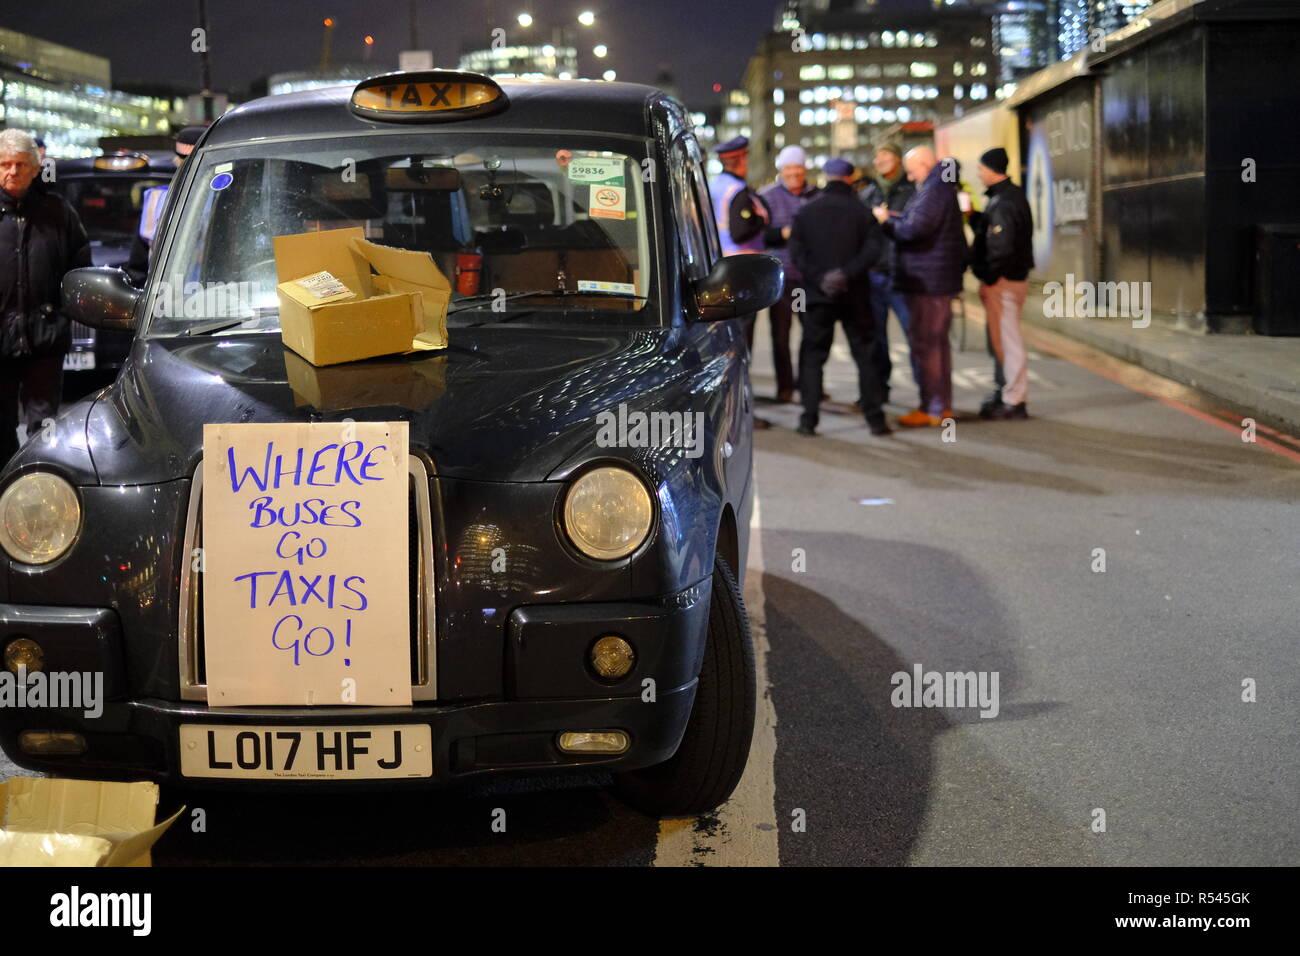 London, UK, 28th November, 2018. London cabbies block London Bridge. Credit: Martin Kelly/Alamy Live News. Stock Photo